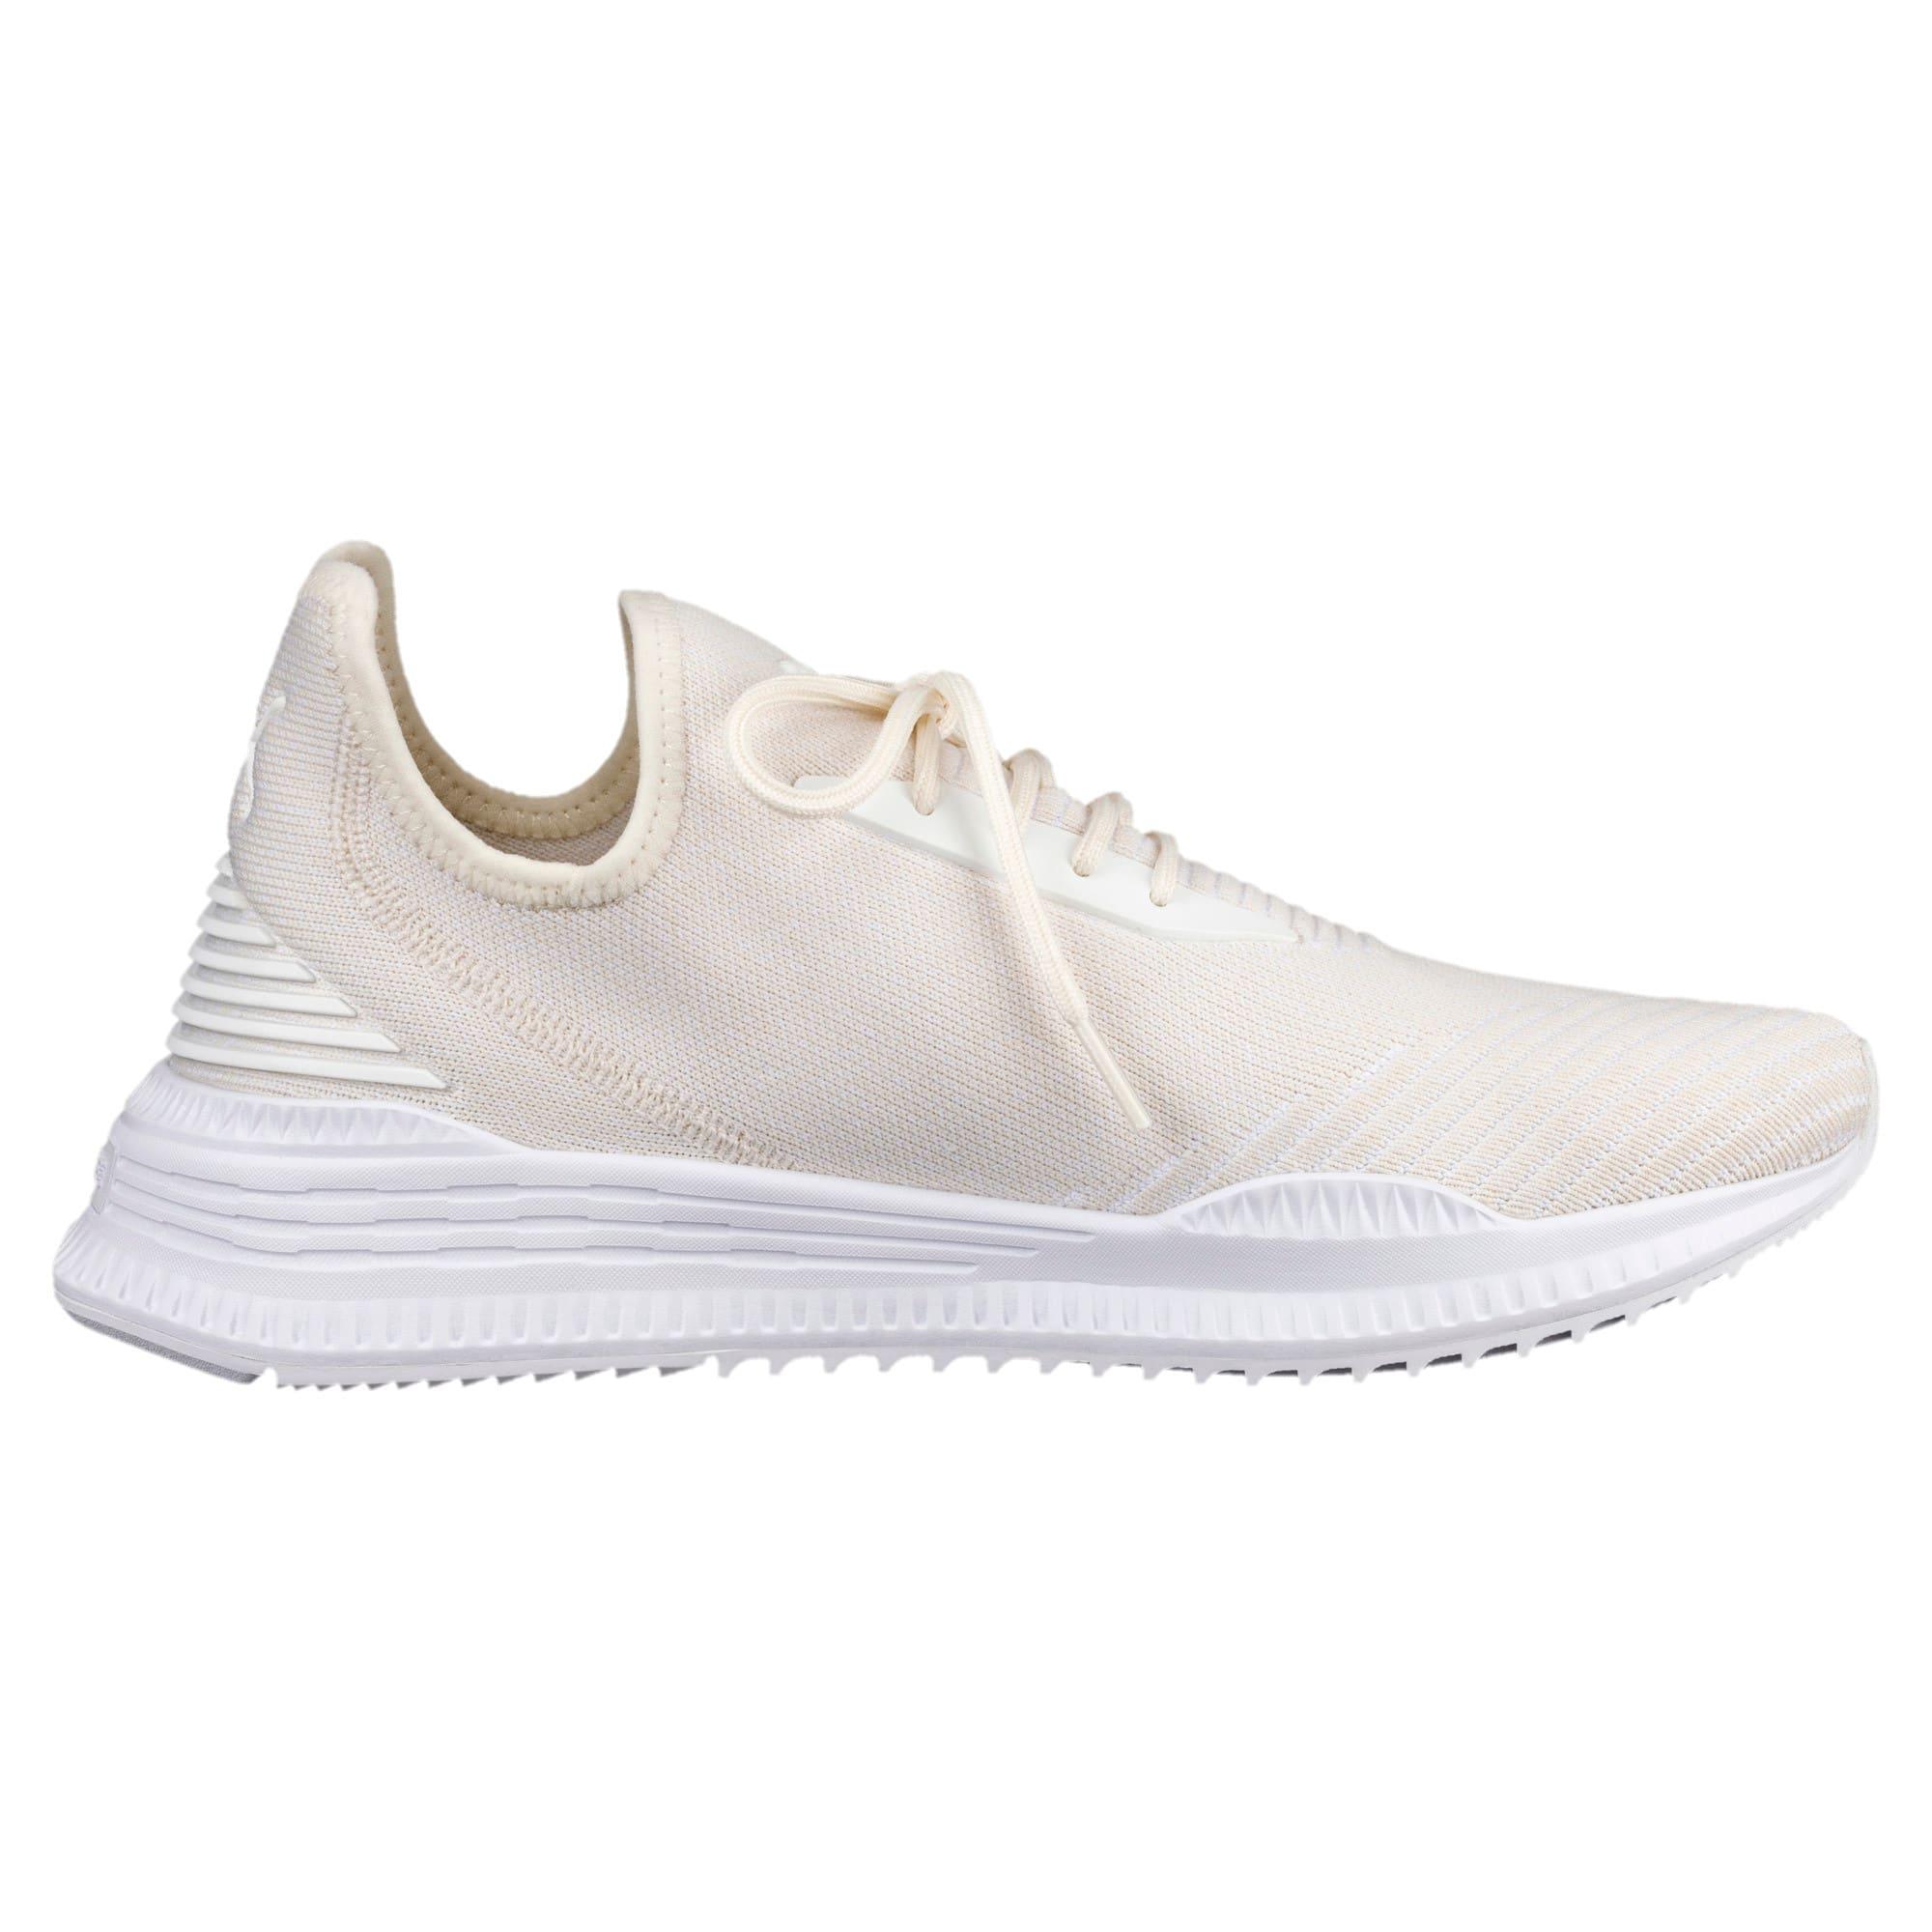 Thumbnail 3 of AVID Men's Sneakers, Whisper White-Puma White, medium